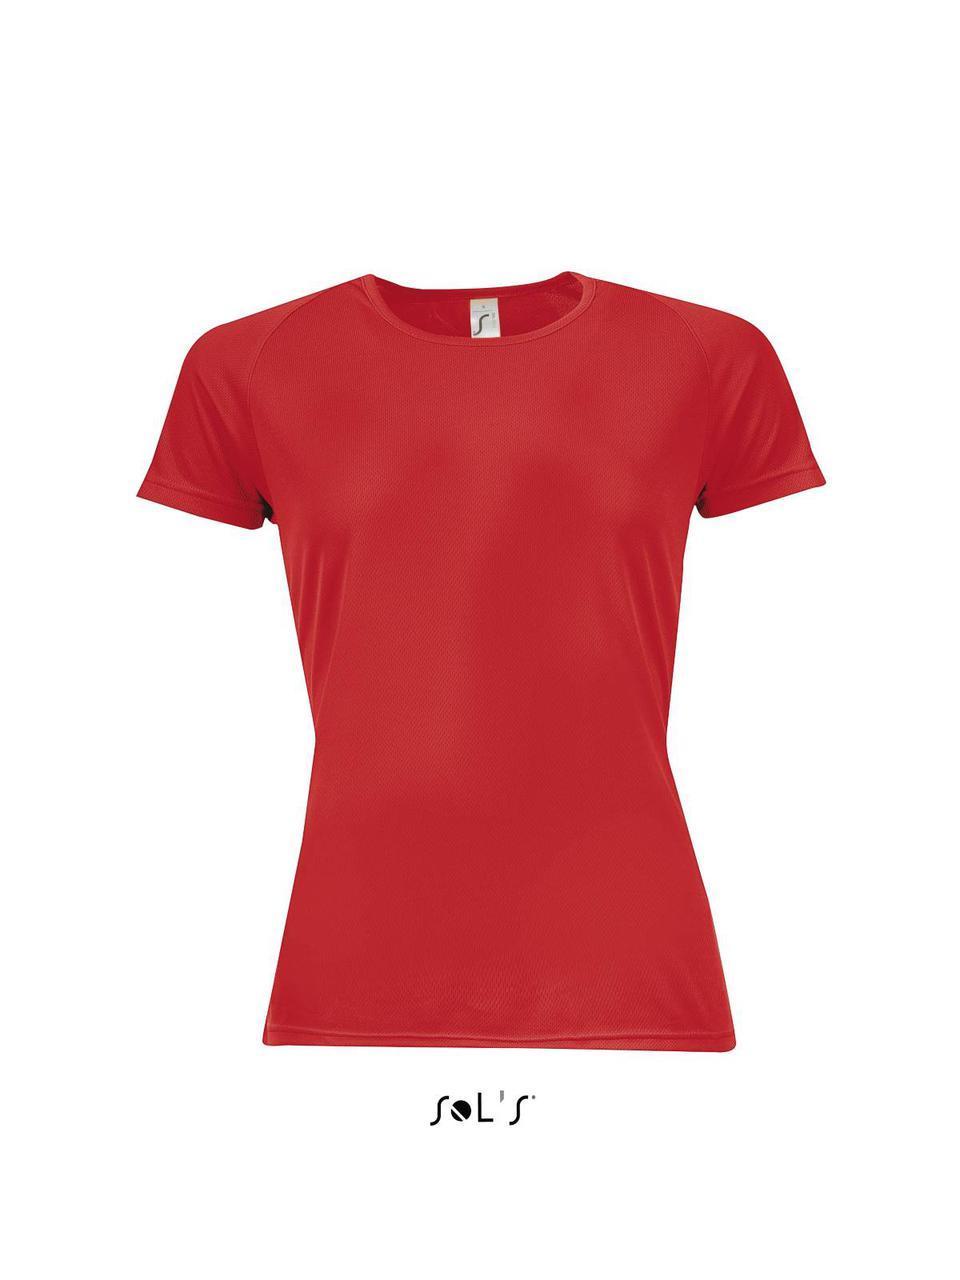 Футболка Sporty женская, размер M, цвет красный